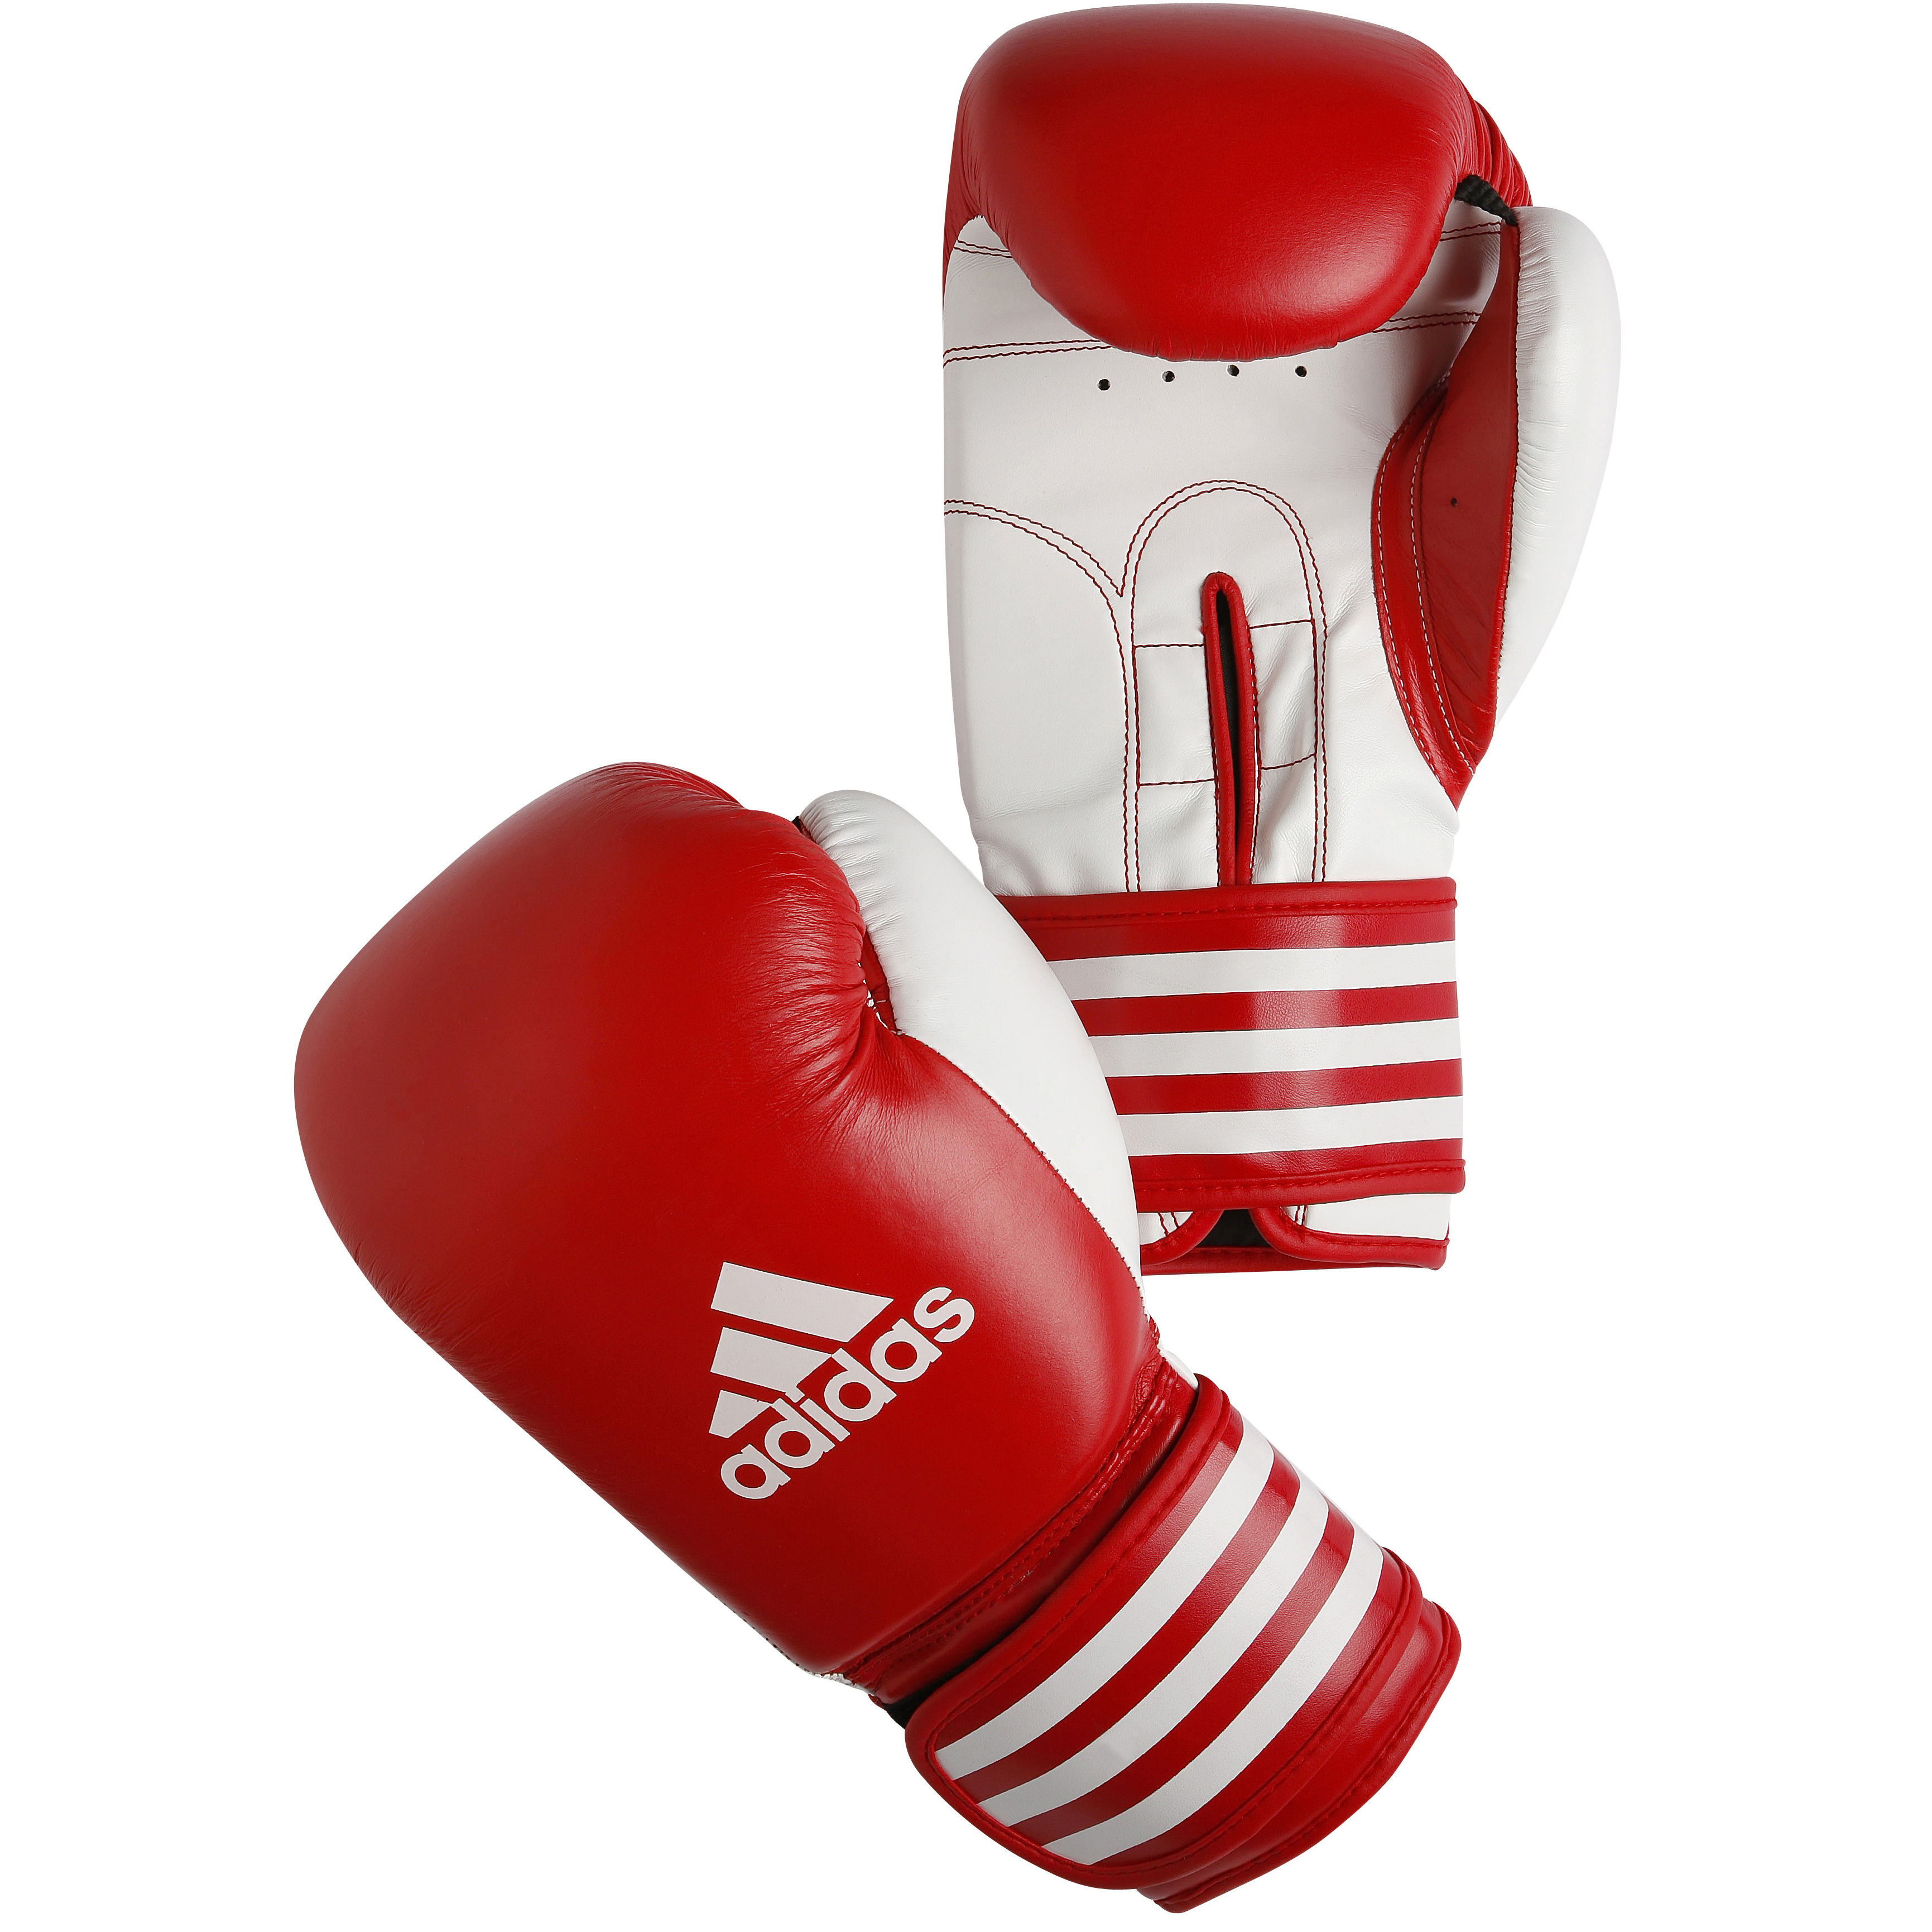 Adidas  Ultima Training Bokshandschoenen - Rood